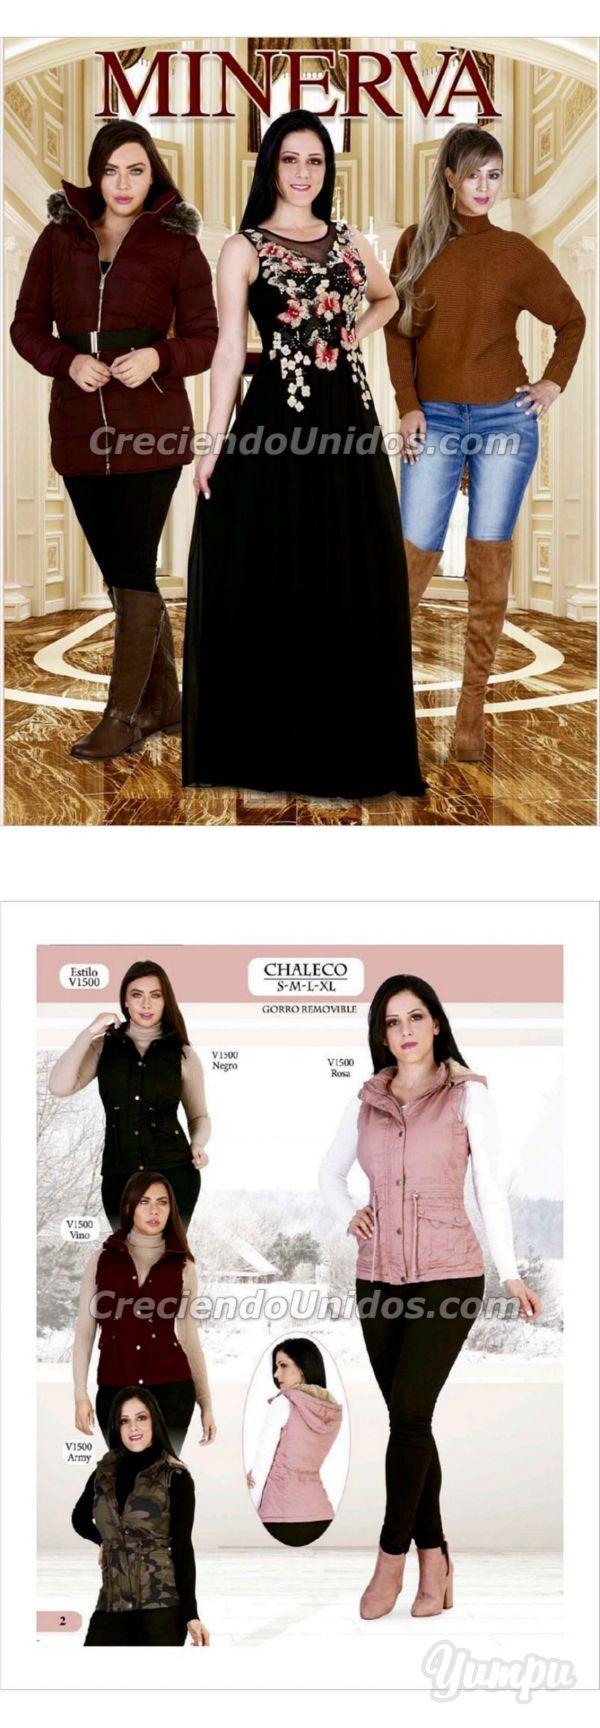 699 Minerva Jeans Catalogo O I 2019 Precios De Mayoreo En Usa Magazine With 194 Pages Mas De 30 000 Productos A Moda Estilo Venta De Ropa Catalogos De Ropa